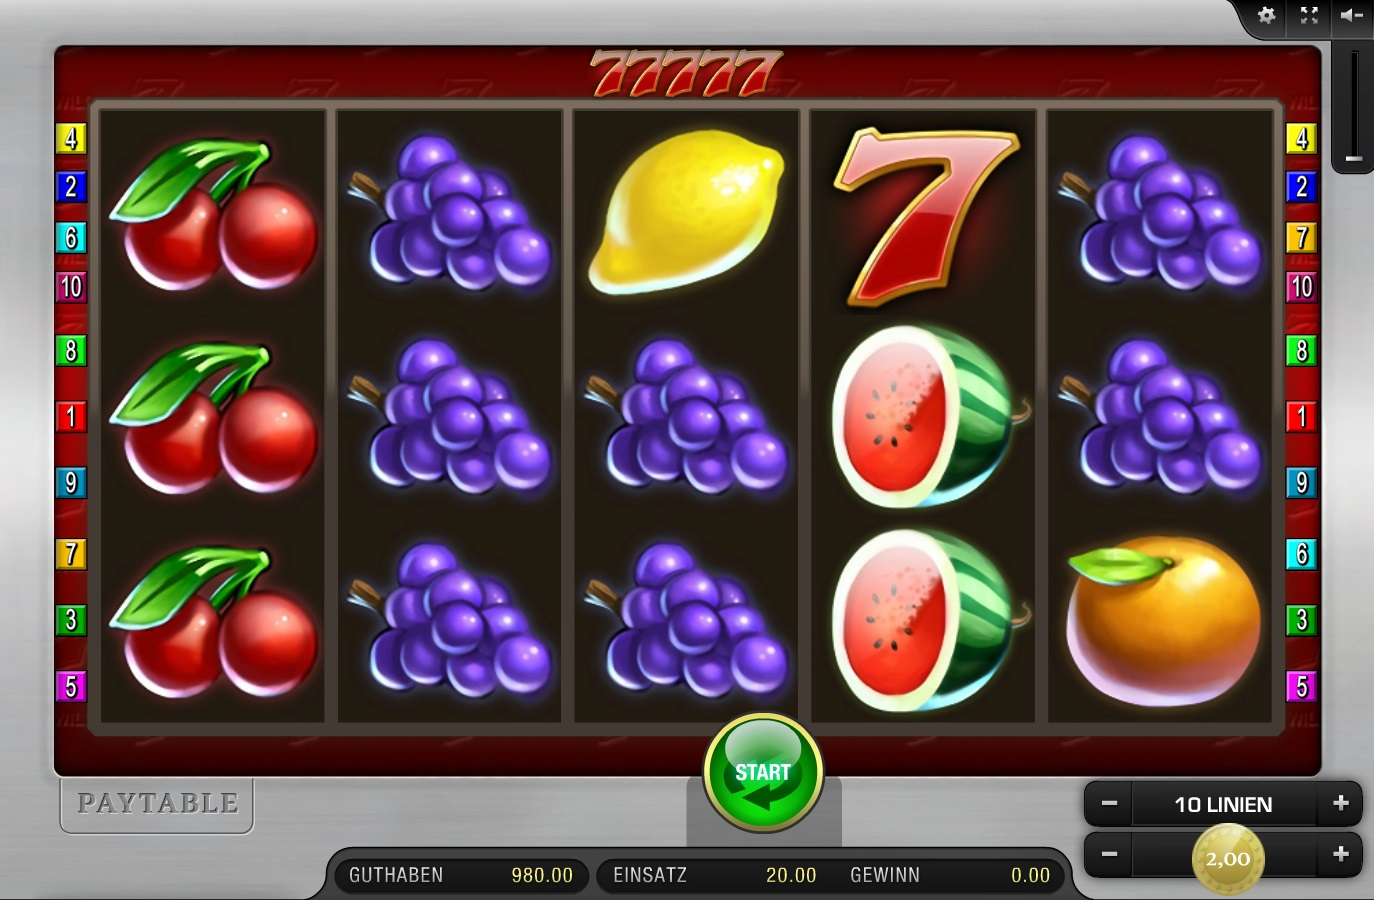 merkur casino online ultra hot online spielen